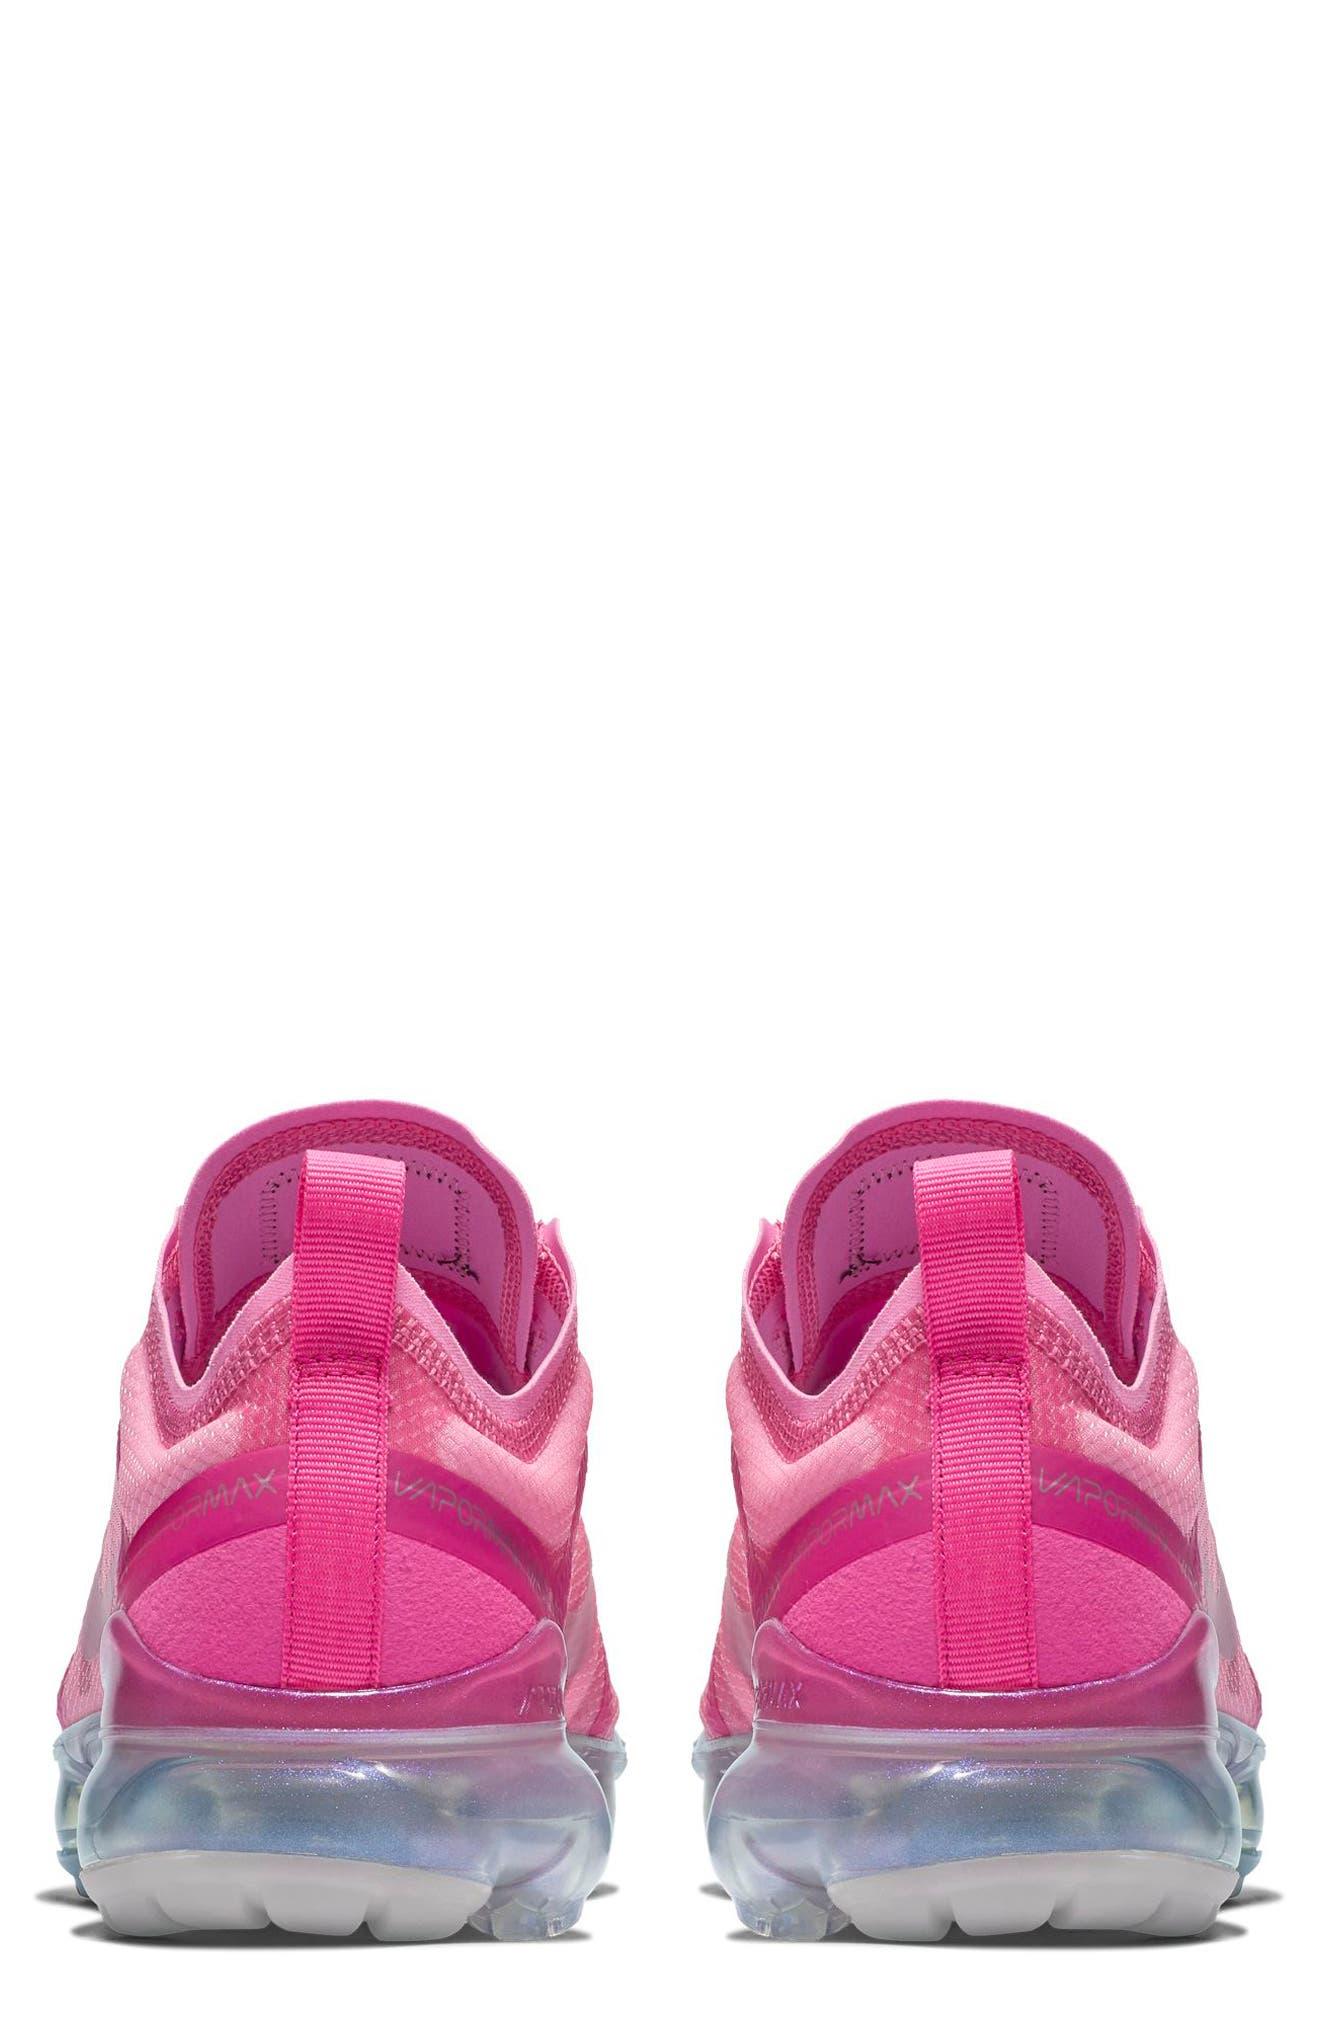 NIKE,                             Air VaporMax 2019 Running Shoe,                             Alternate thumbnail 2, color,                             ACTIVE FUCHSIA/ LASER FUCHSIA